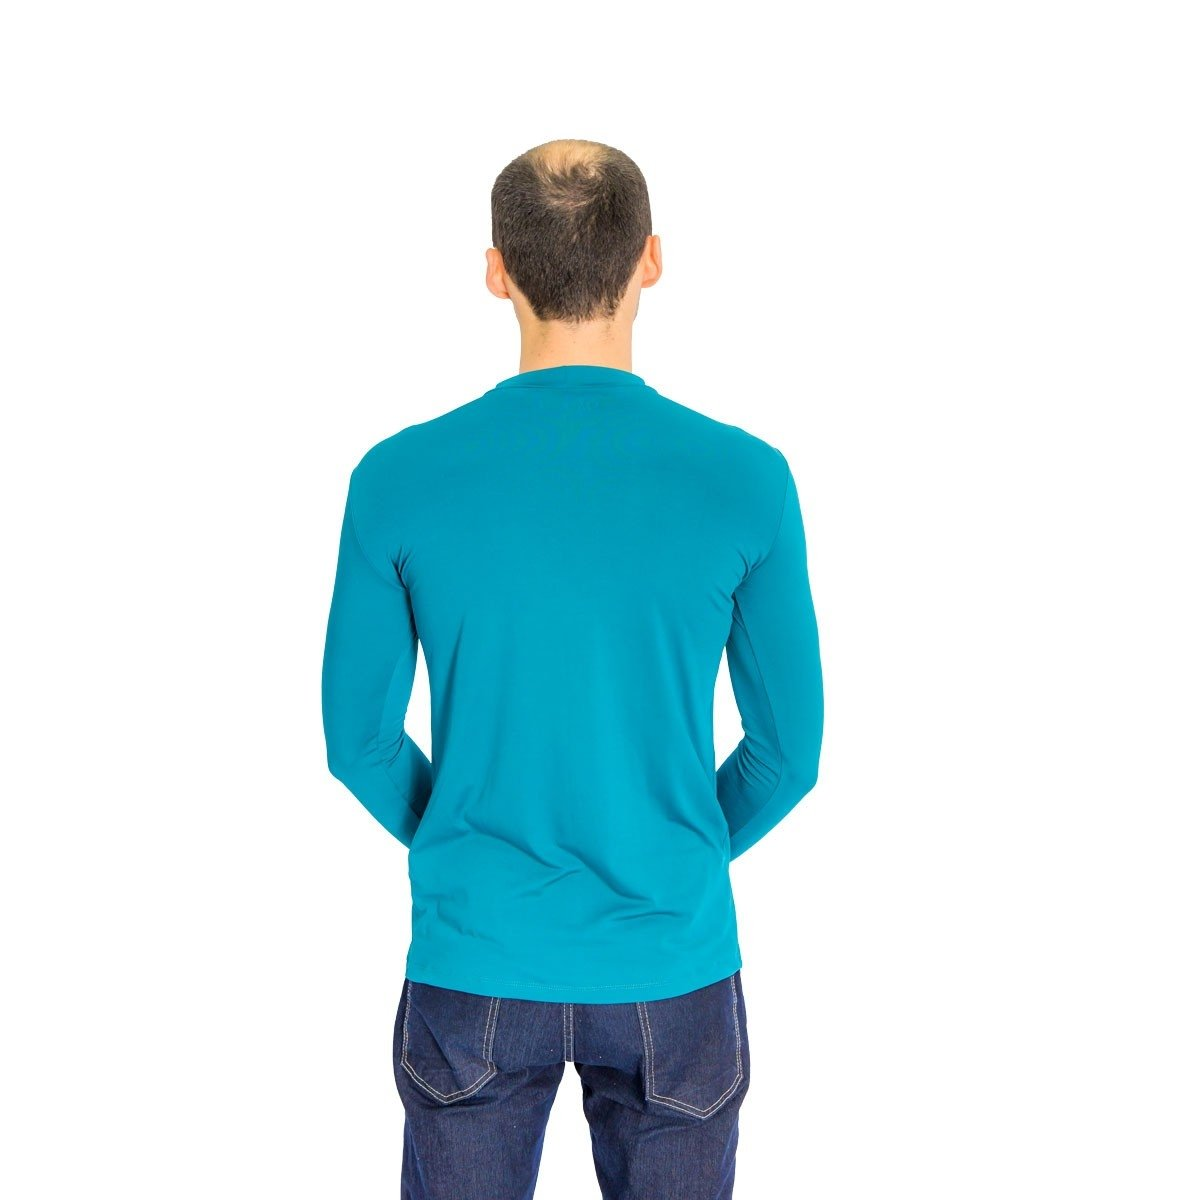 Azul Camiseta Térmica Camiseta Petróleo Masculina Manga Longa Térmica vYz1Pqz